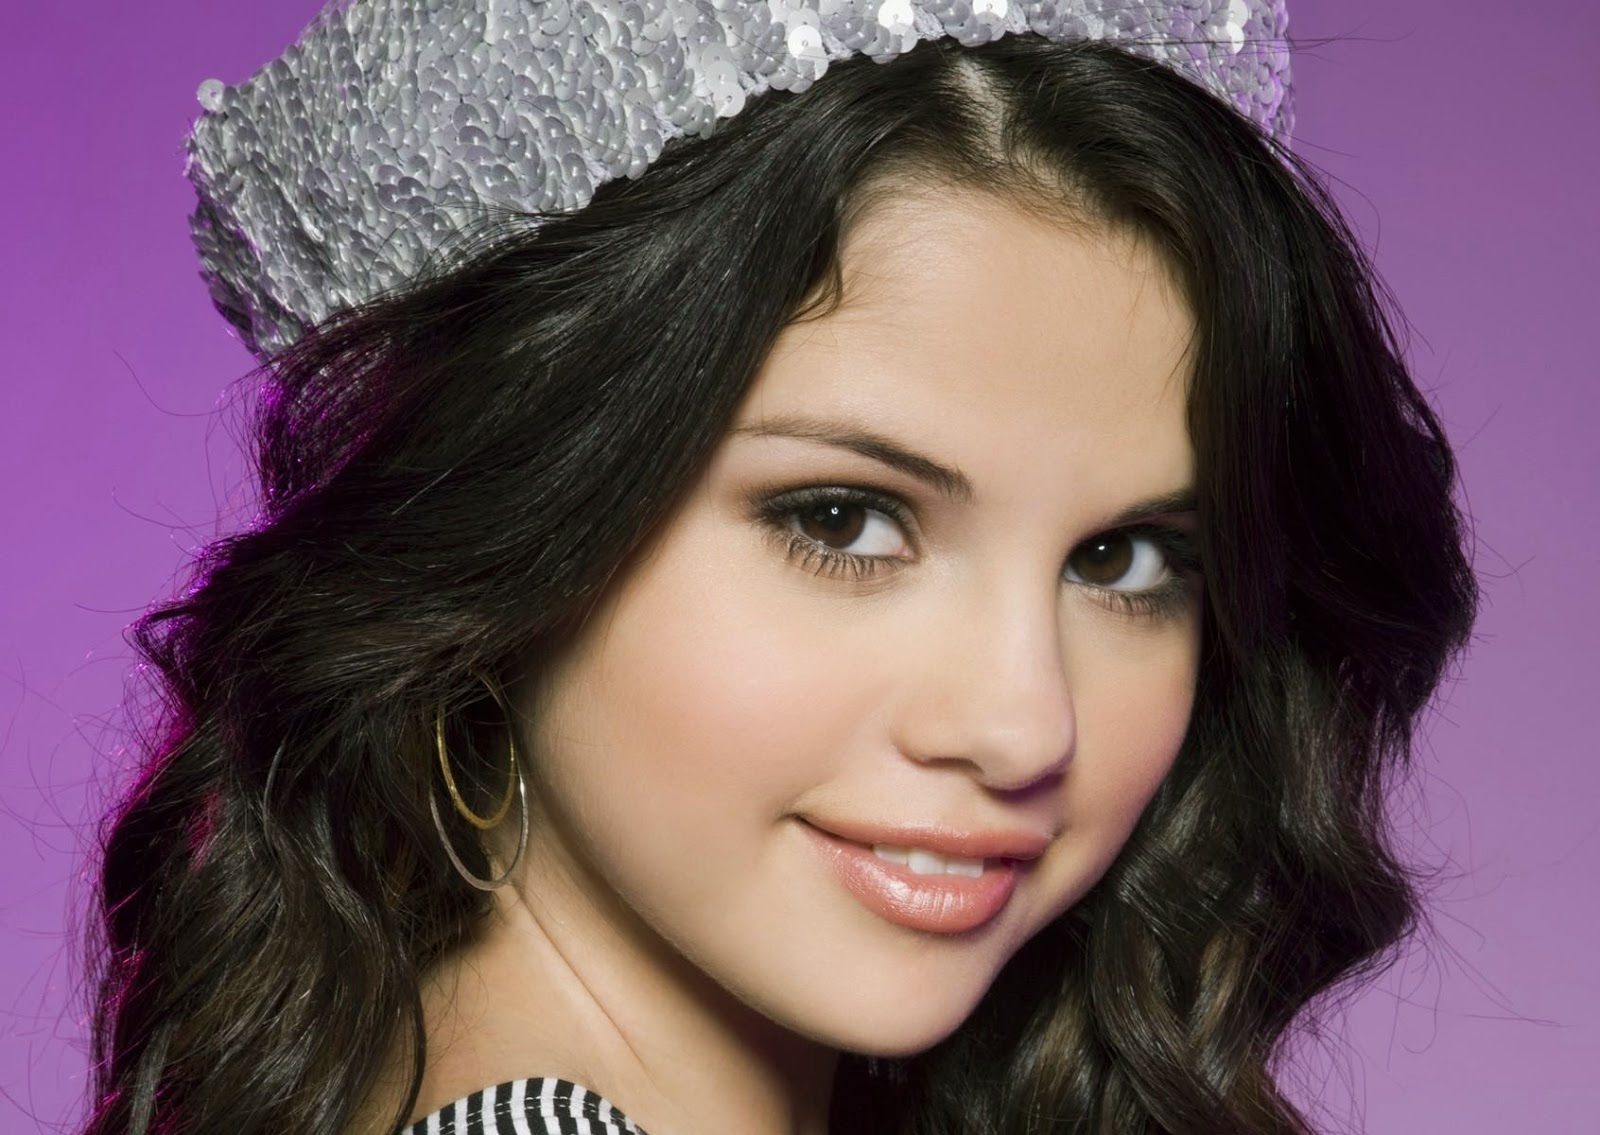 4u HD Wallpaper Download Selena Gomez Wallpapers Download 1600x1135